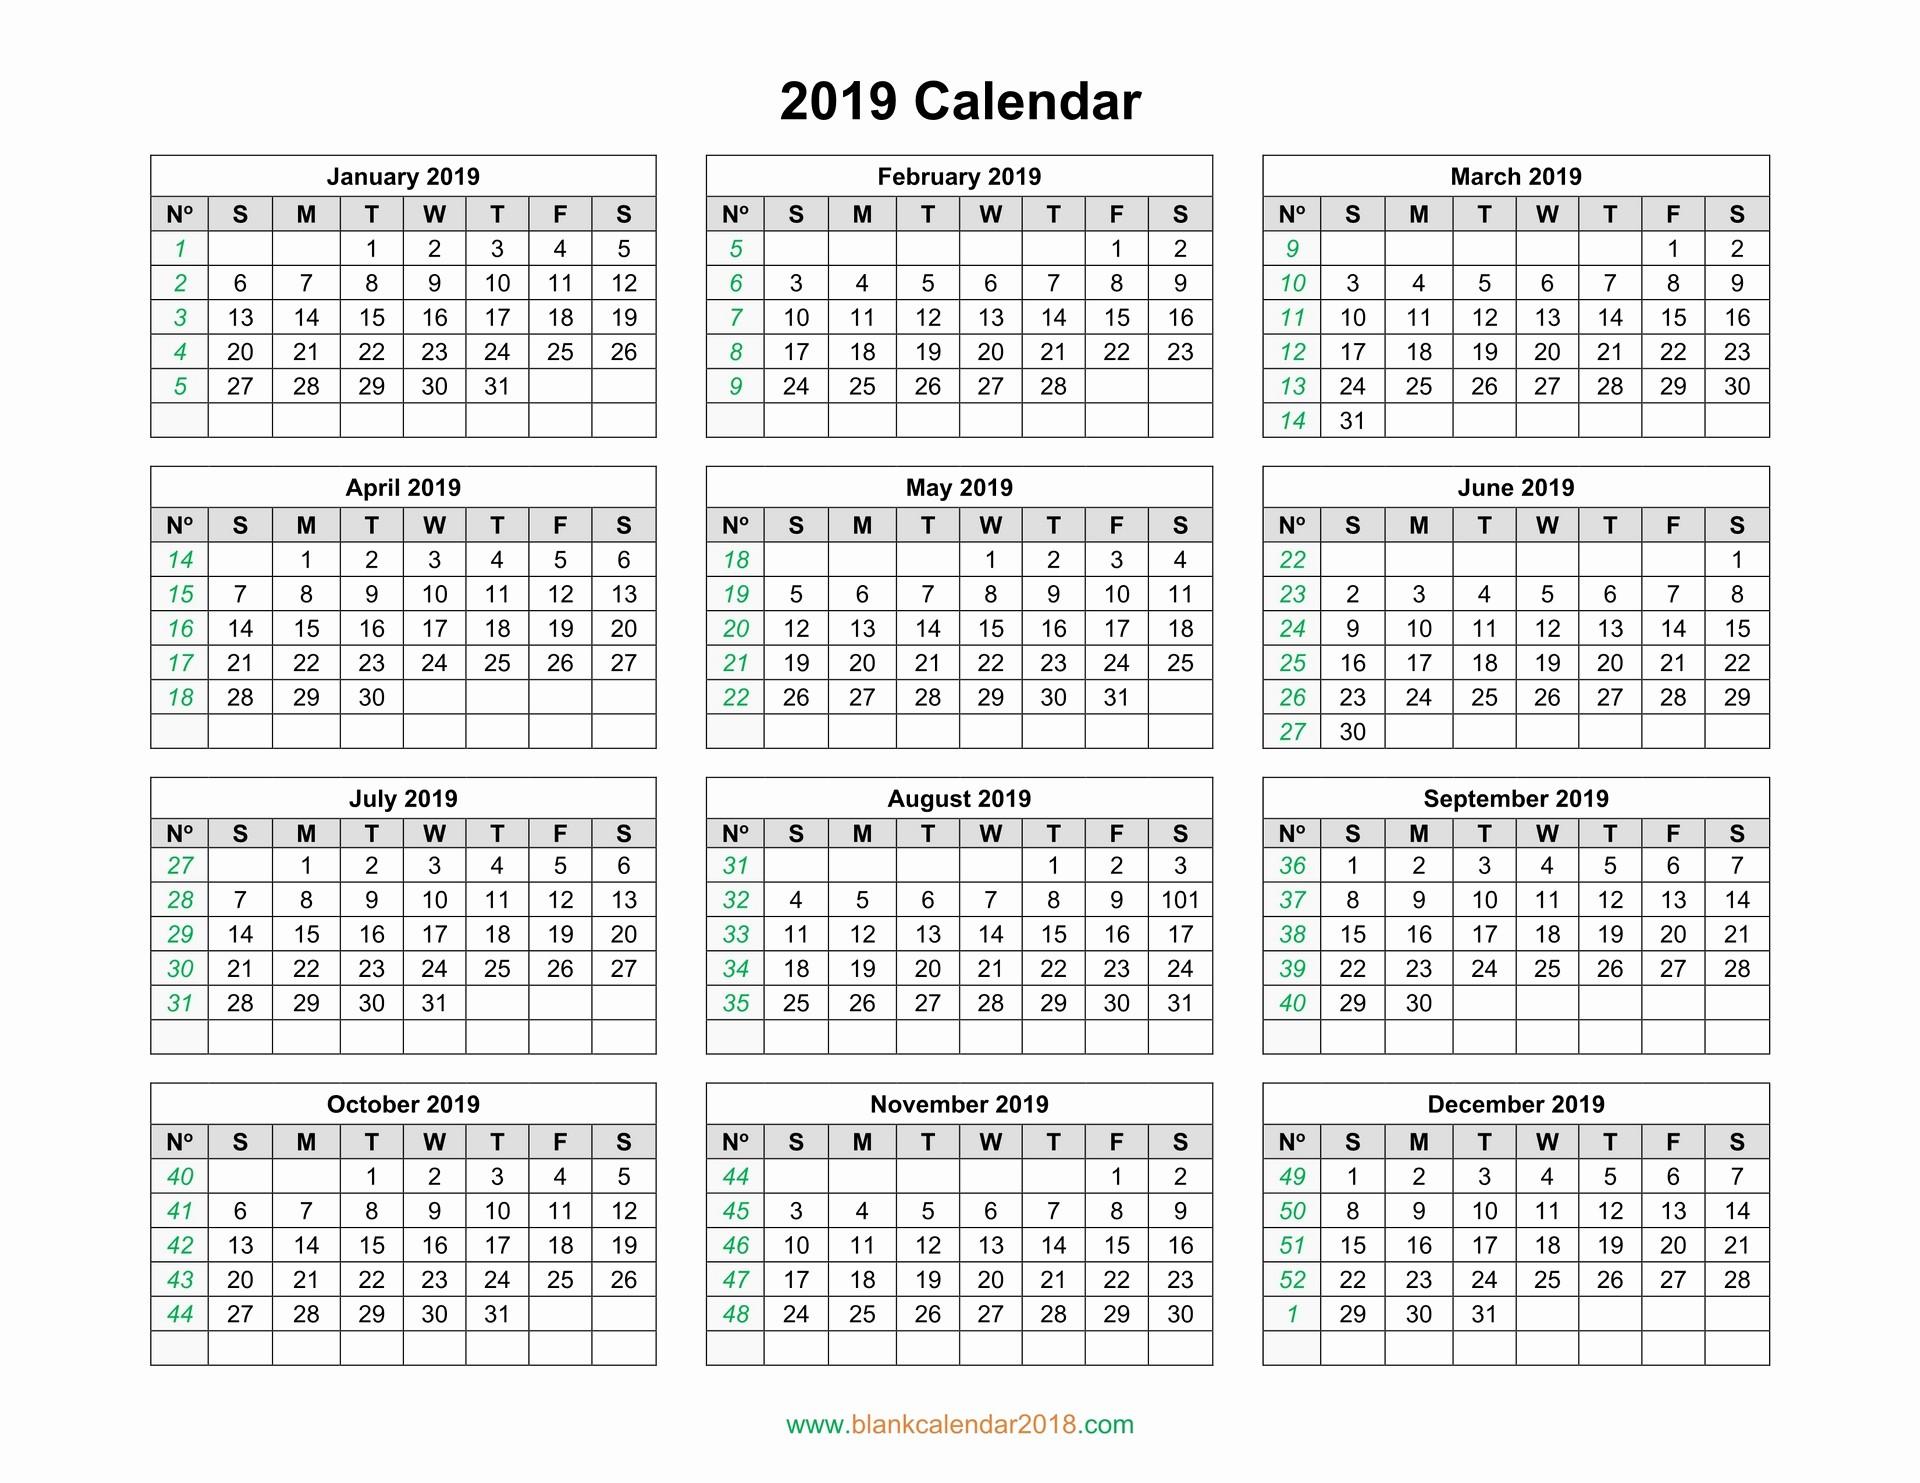 Free Printable 2019 Yearly Calendar Awesome Blank Calendar 2019